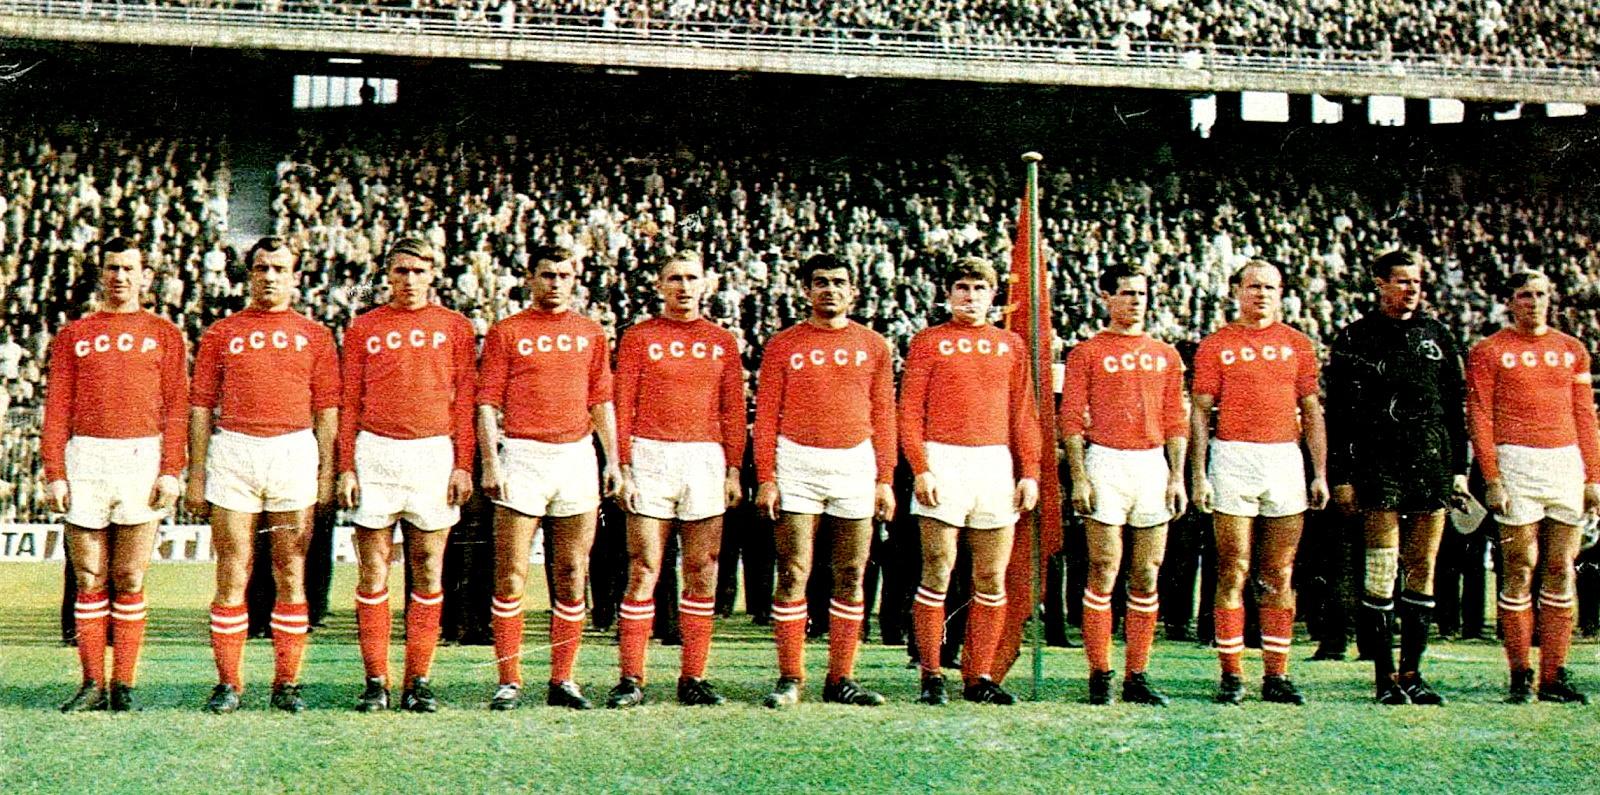 CCCP 1966 retro shirt, the World Cup 1966